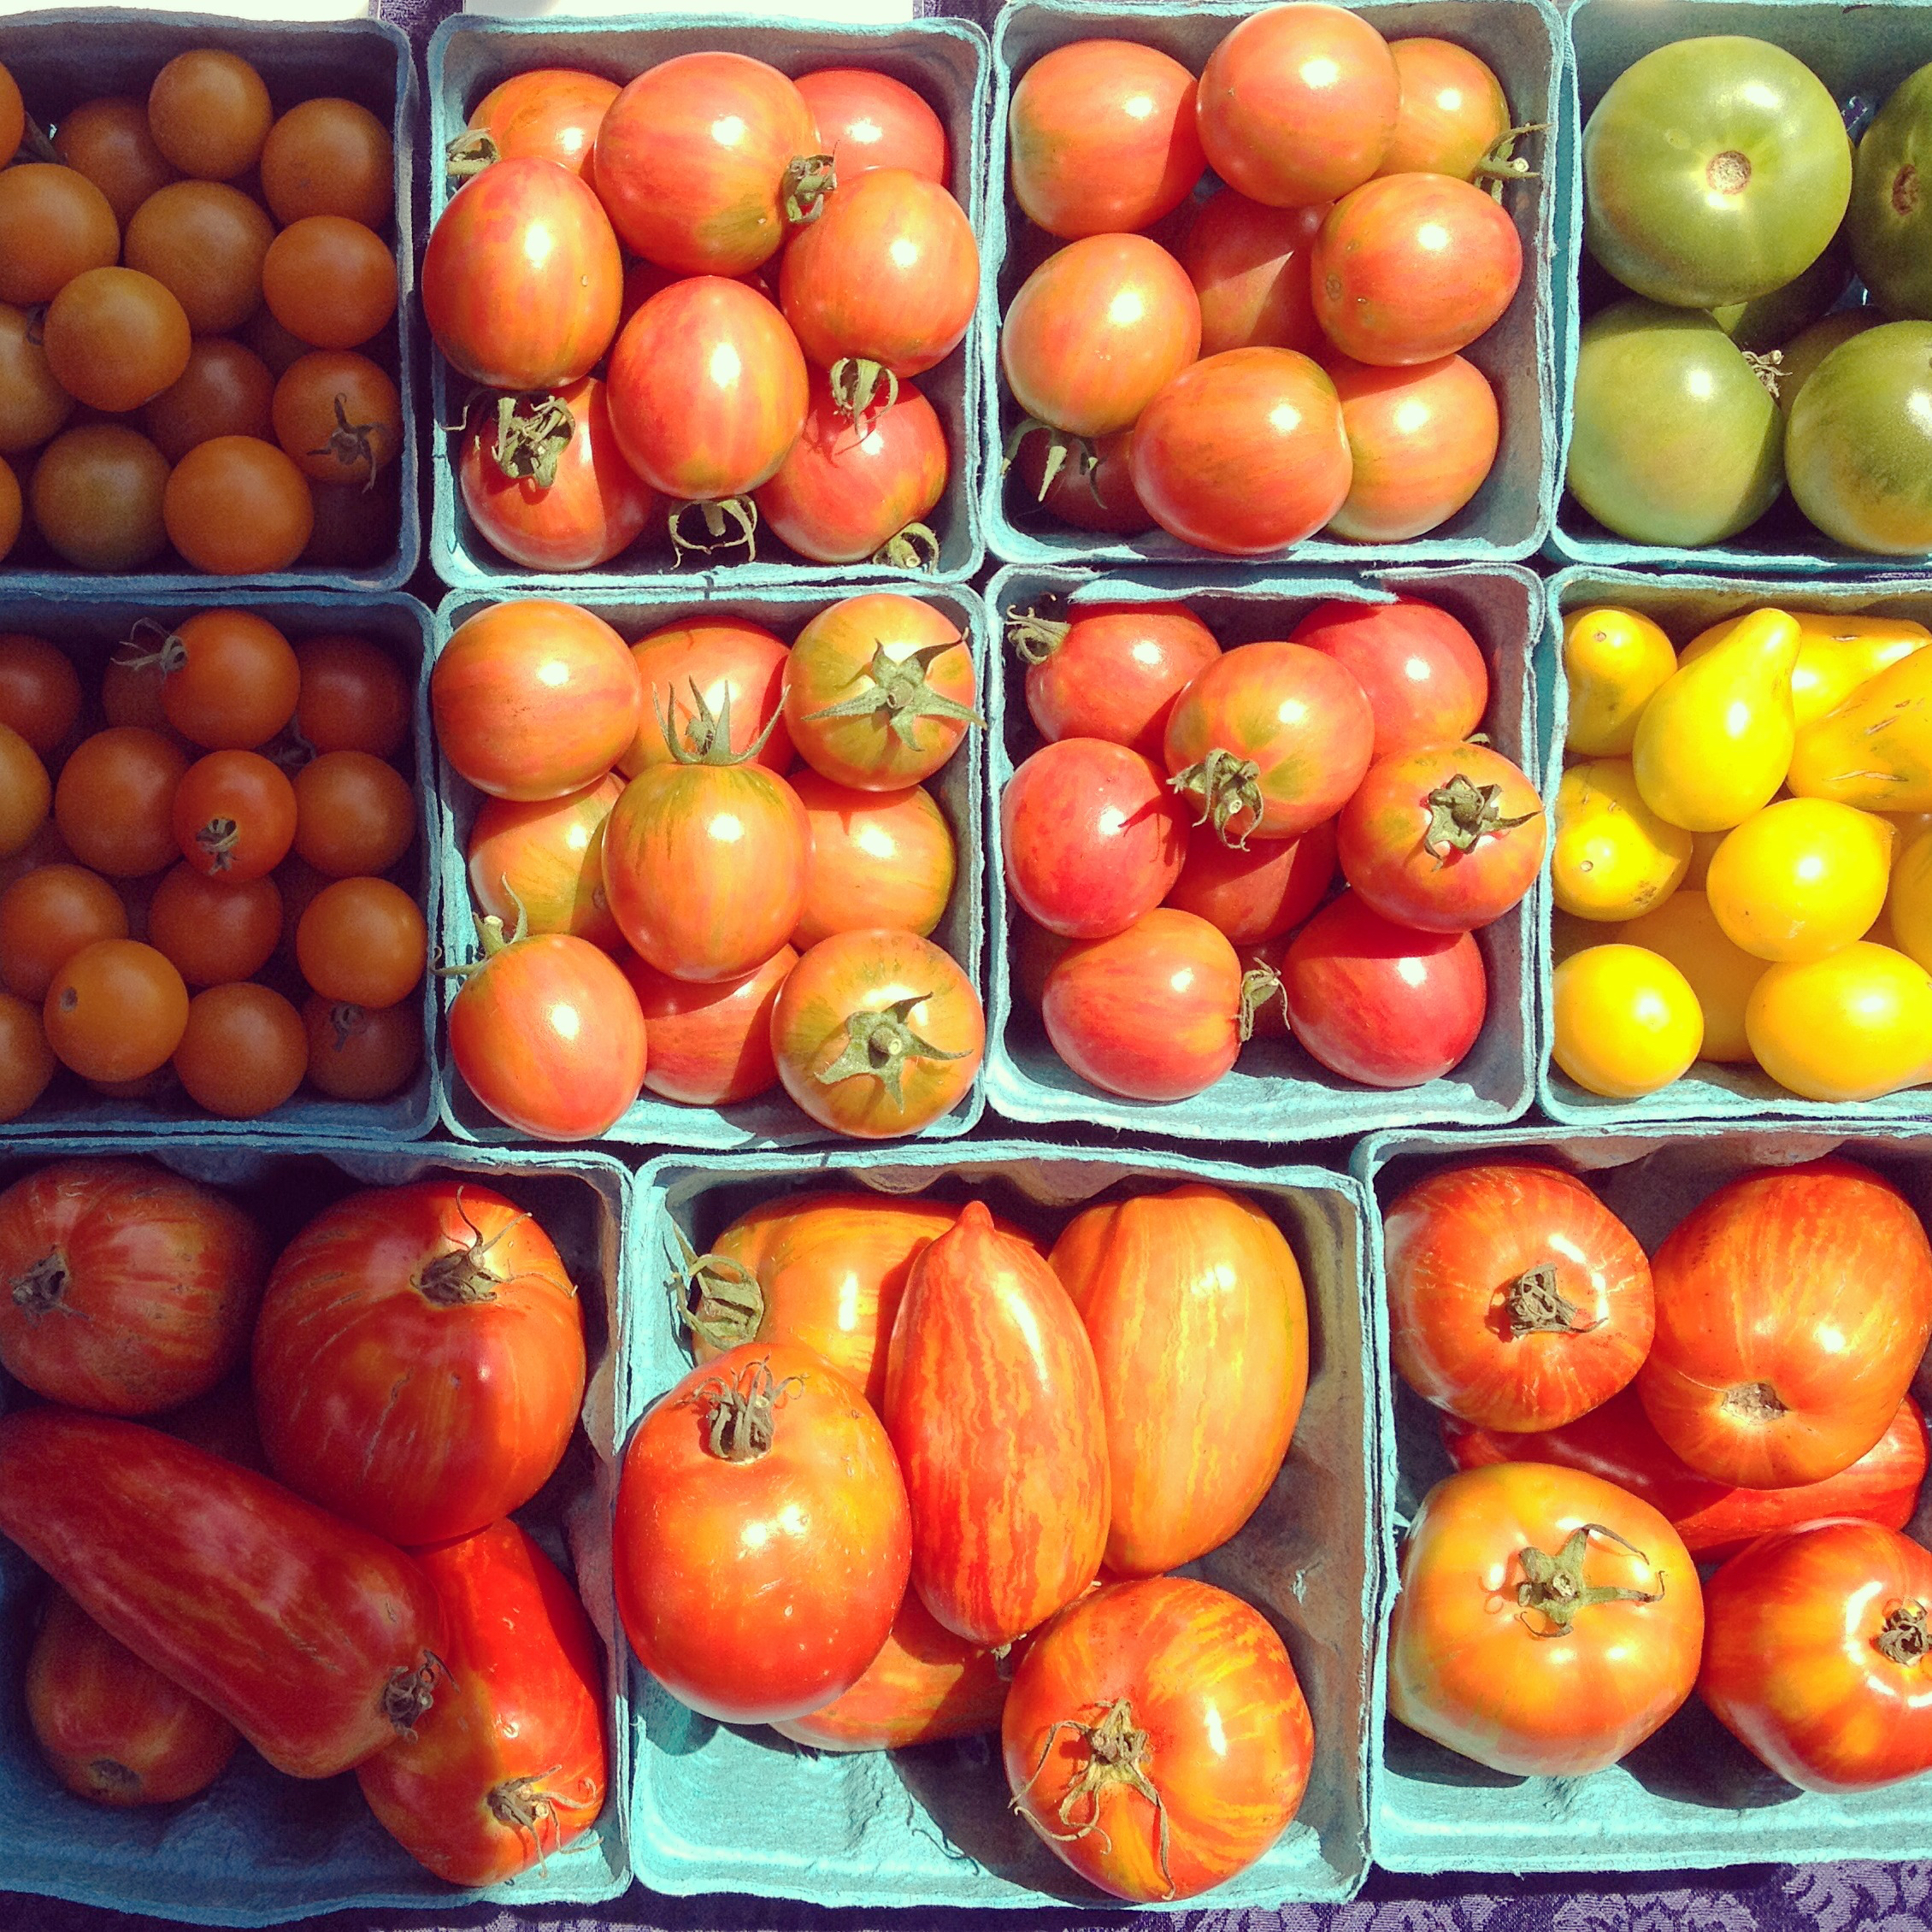 Rainbow cherry tomatoes